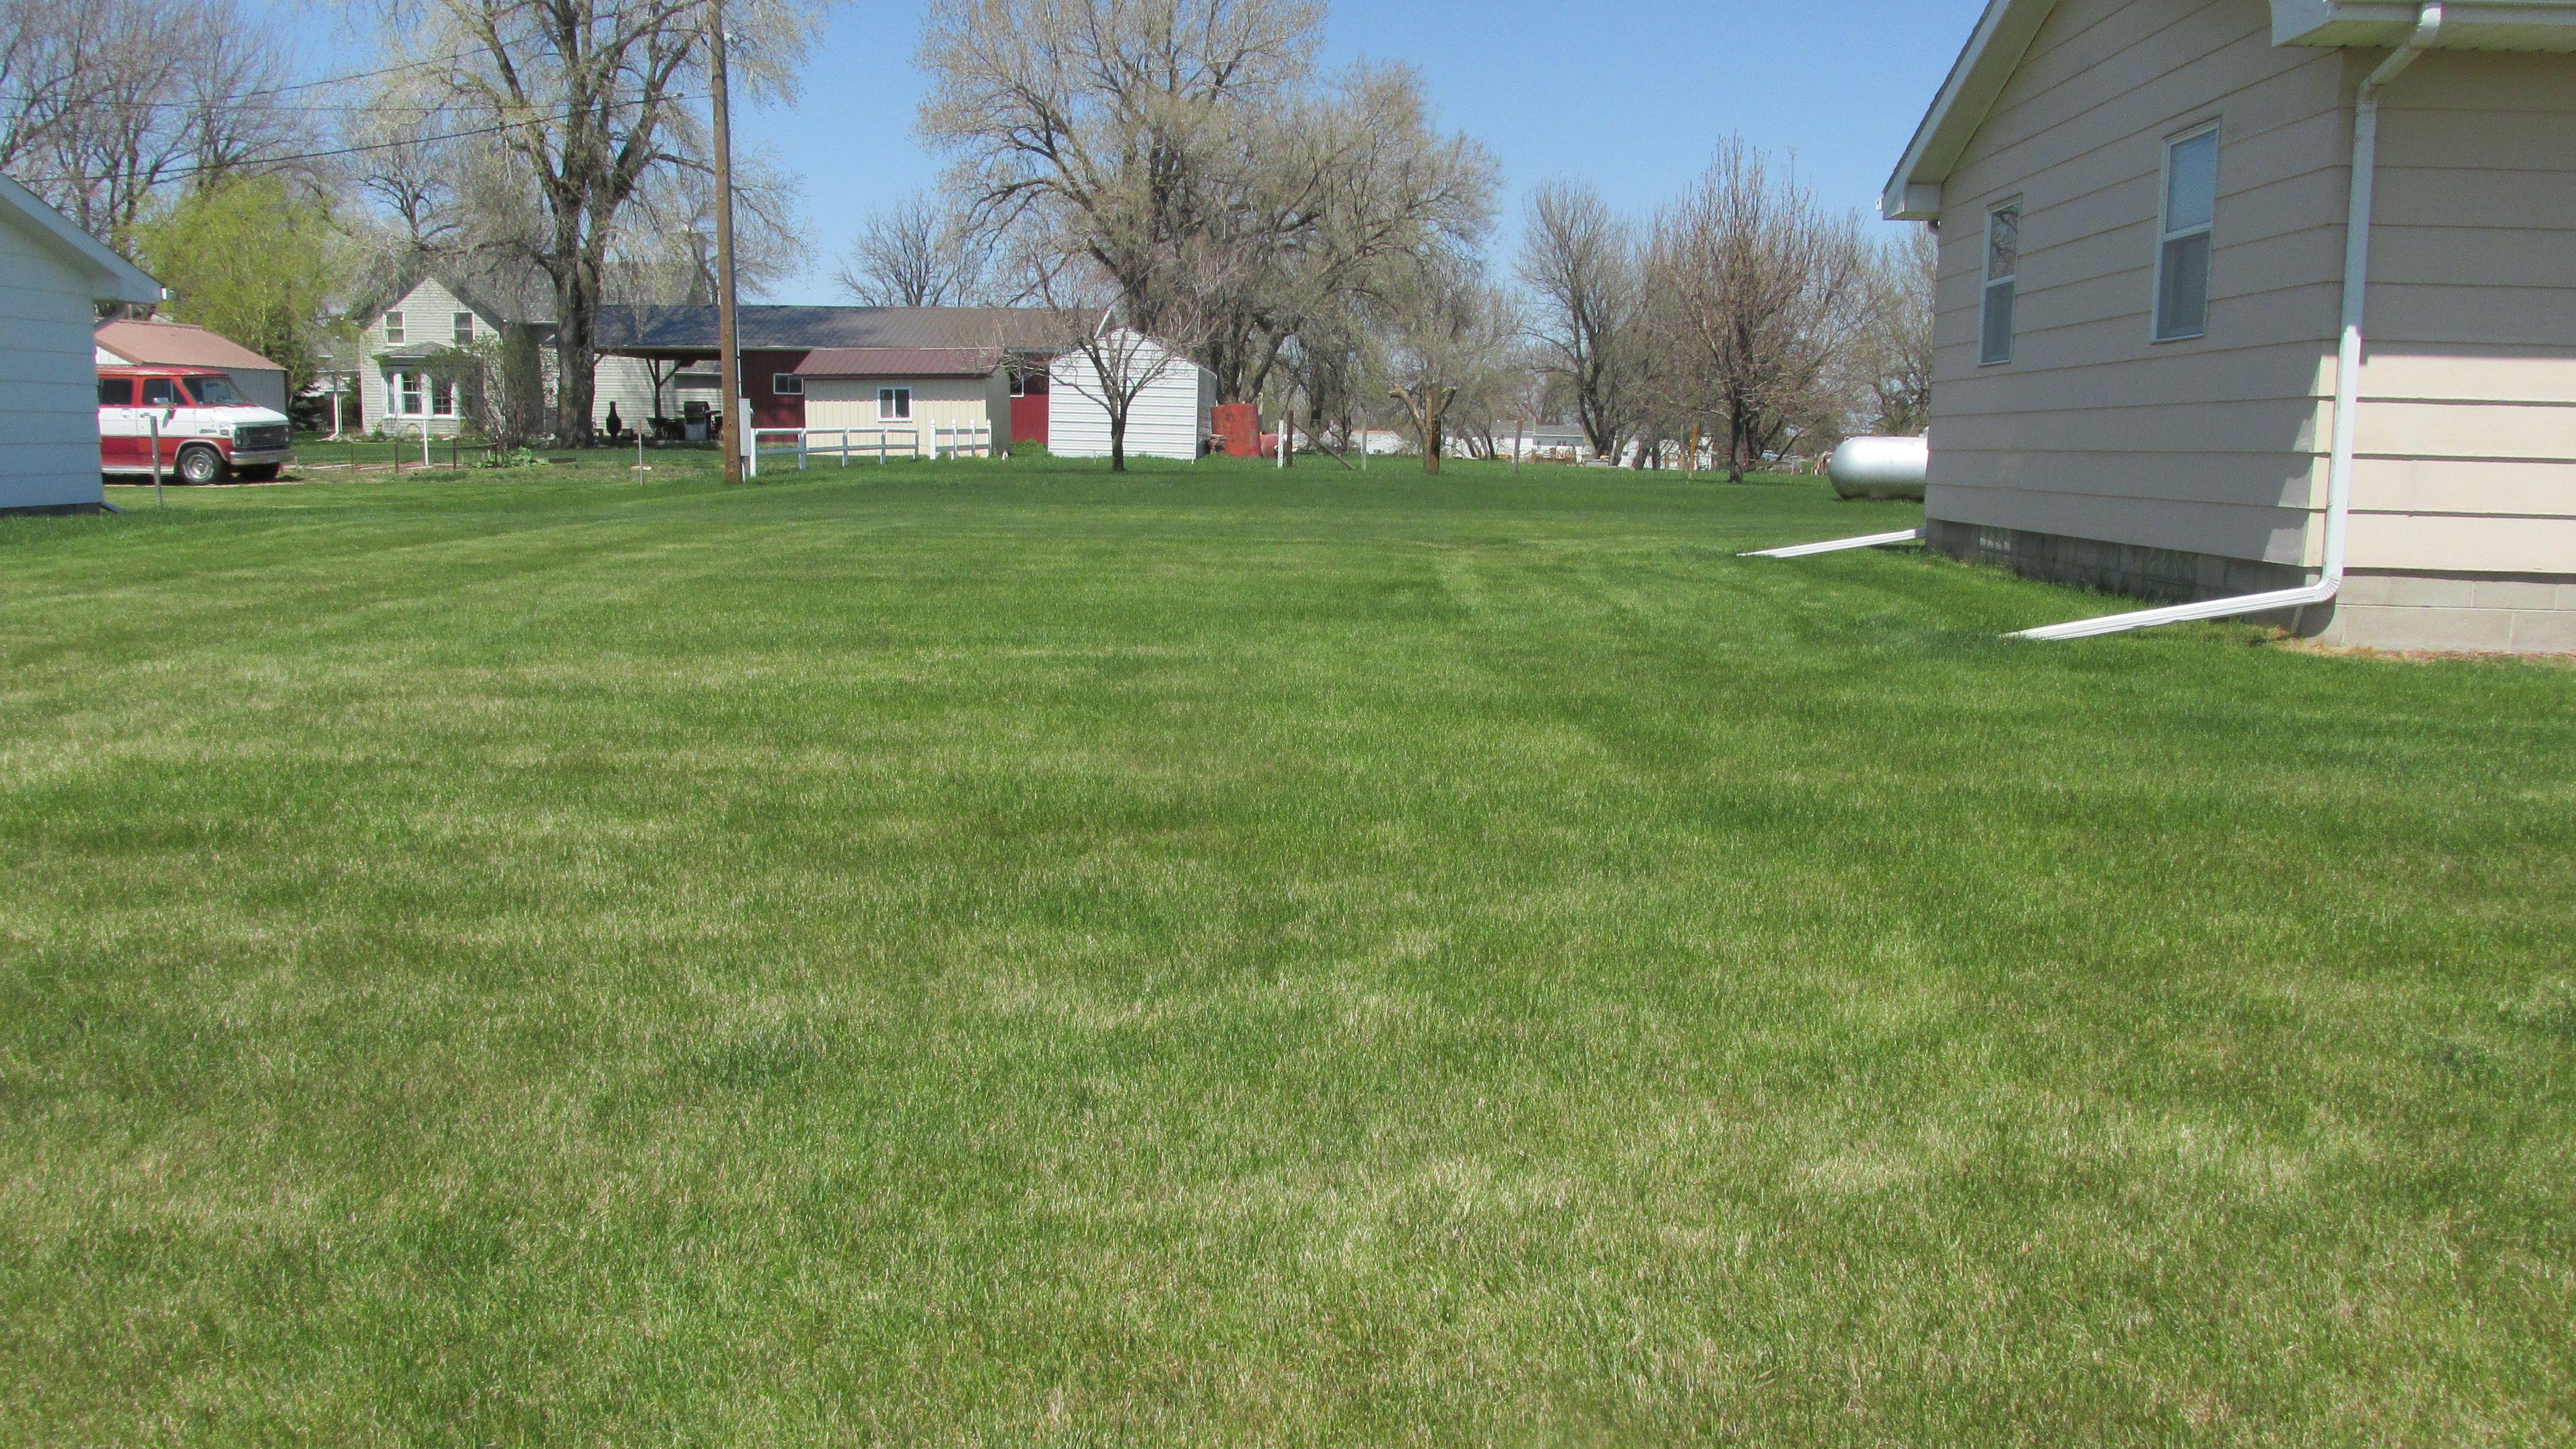 West lawn